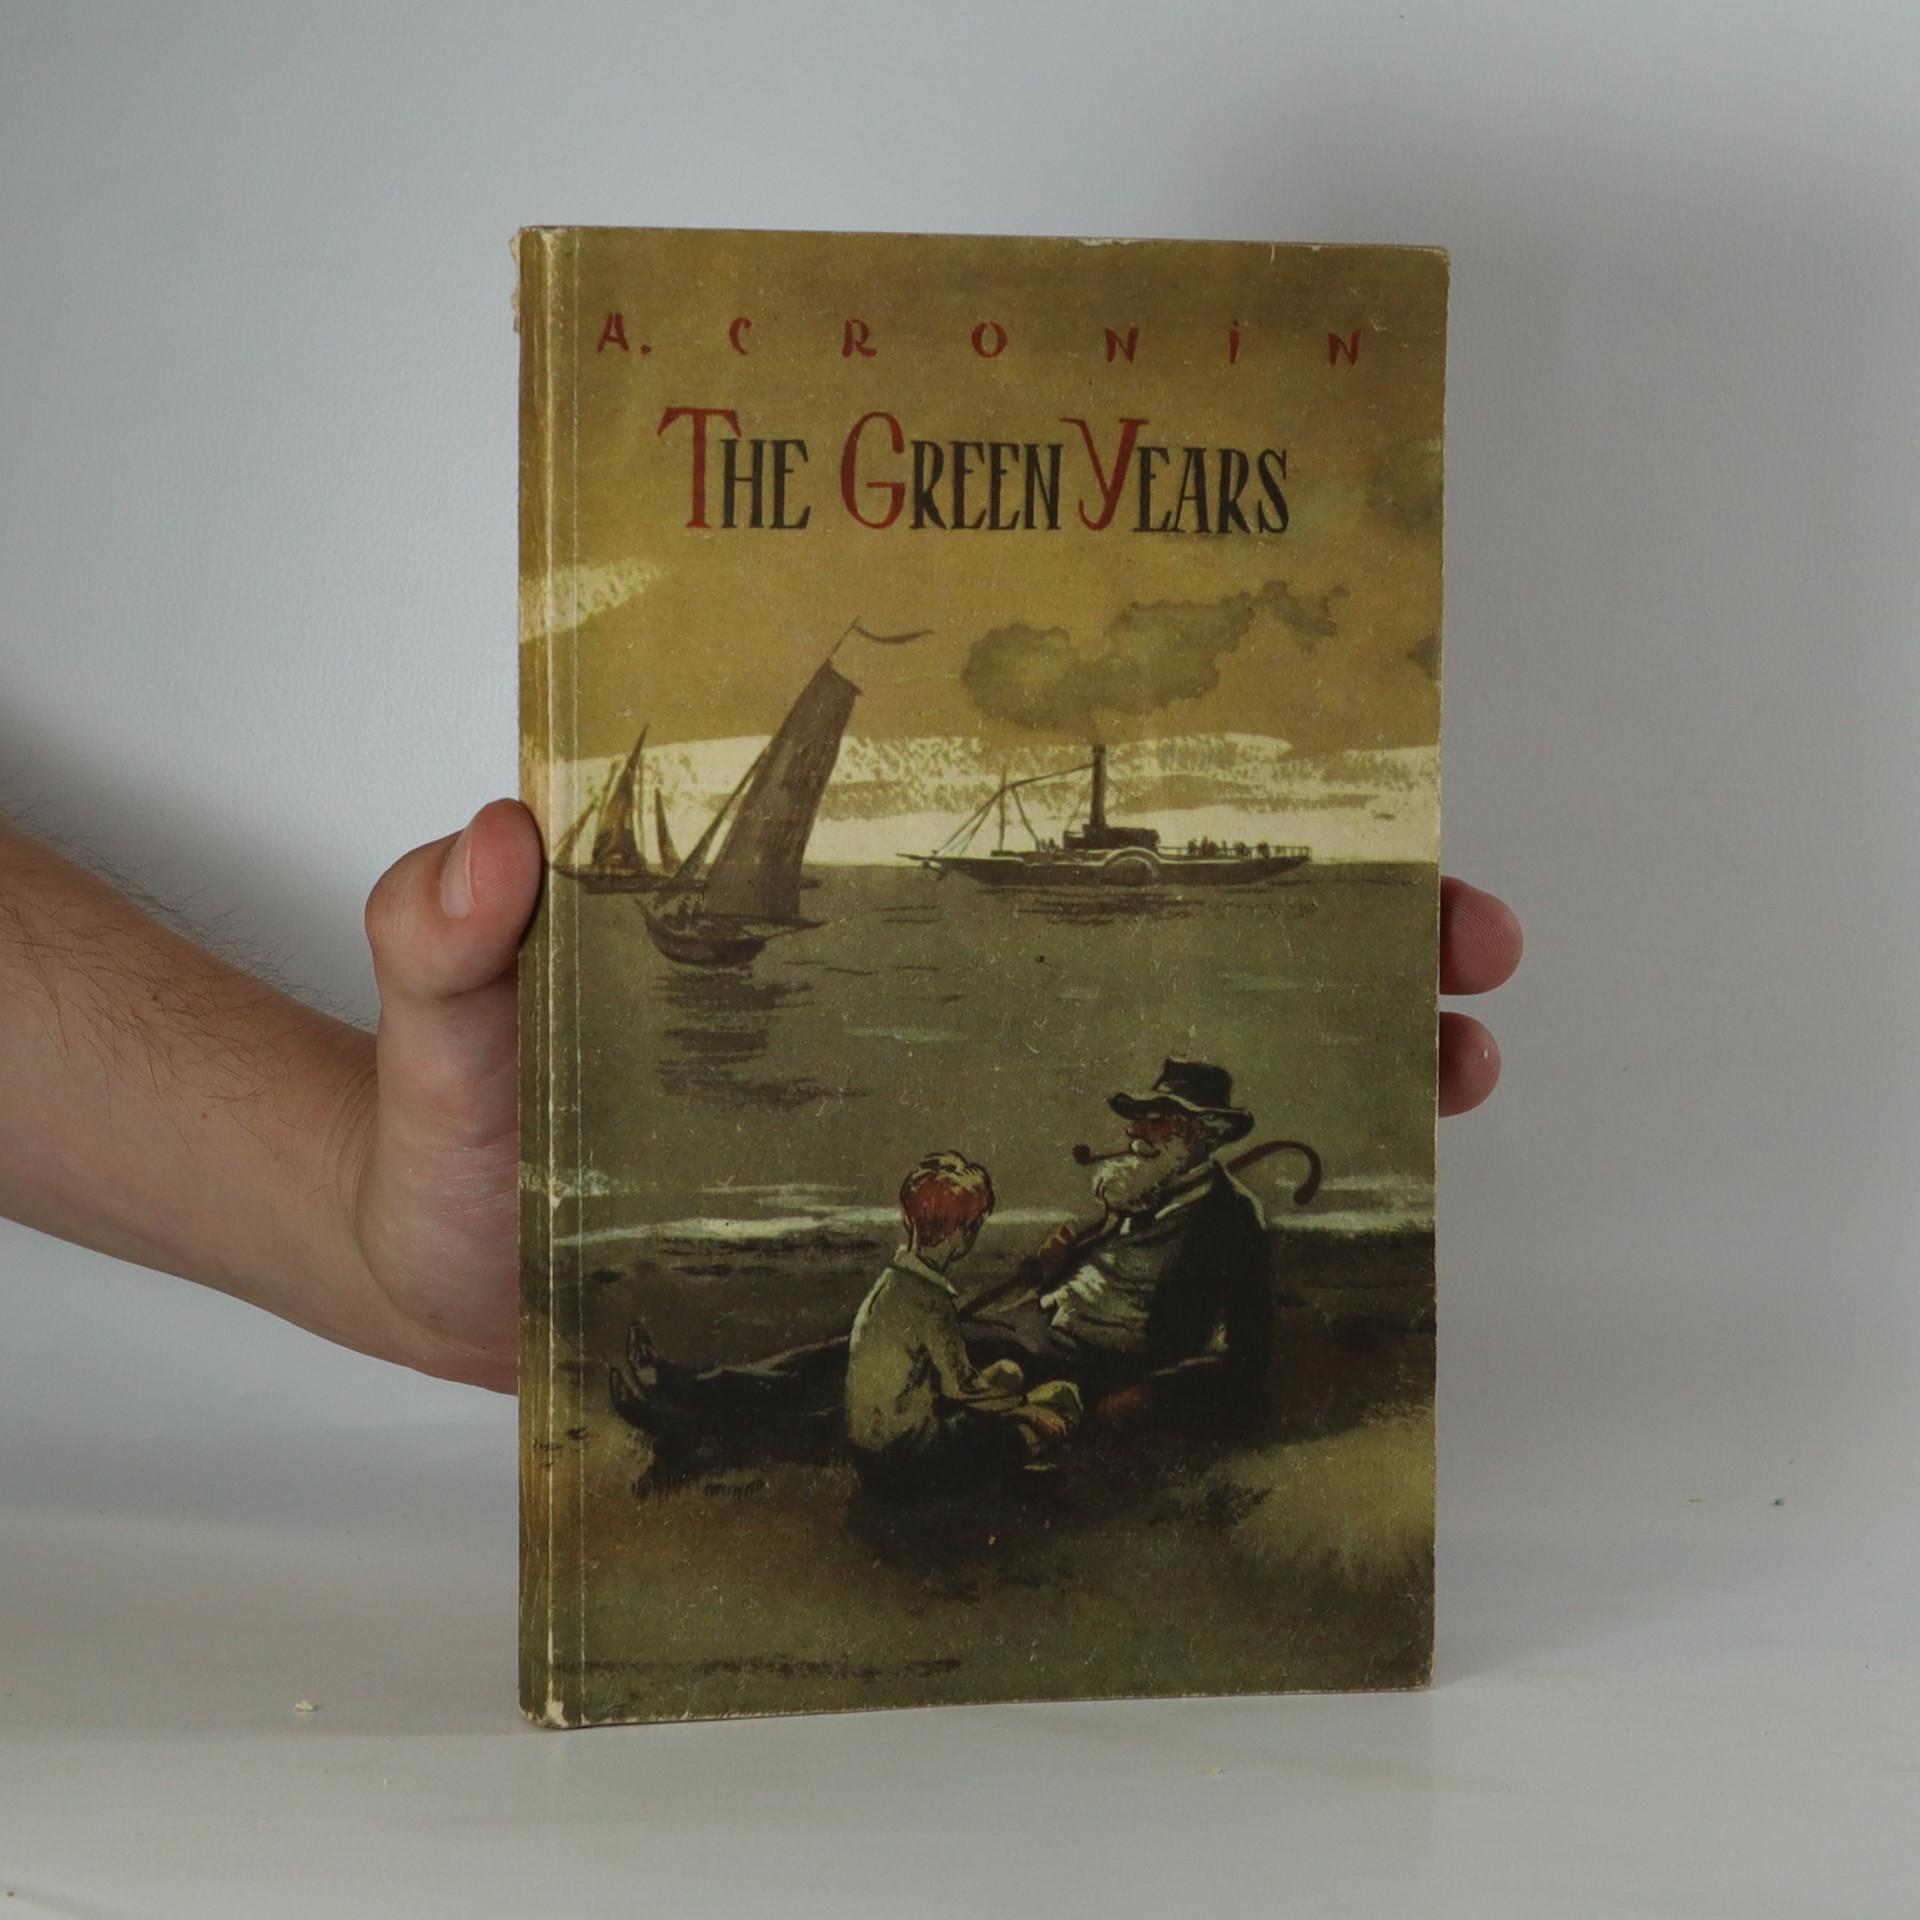 antikvární kniha The green years, 1970